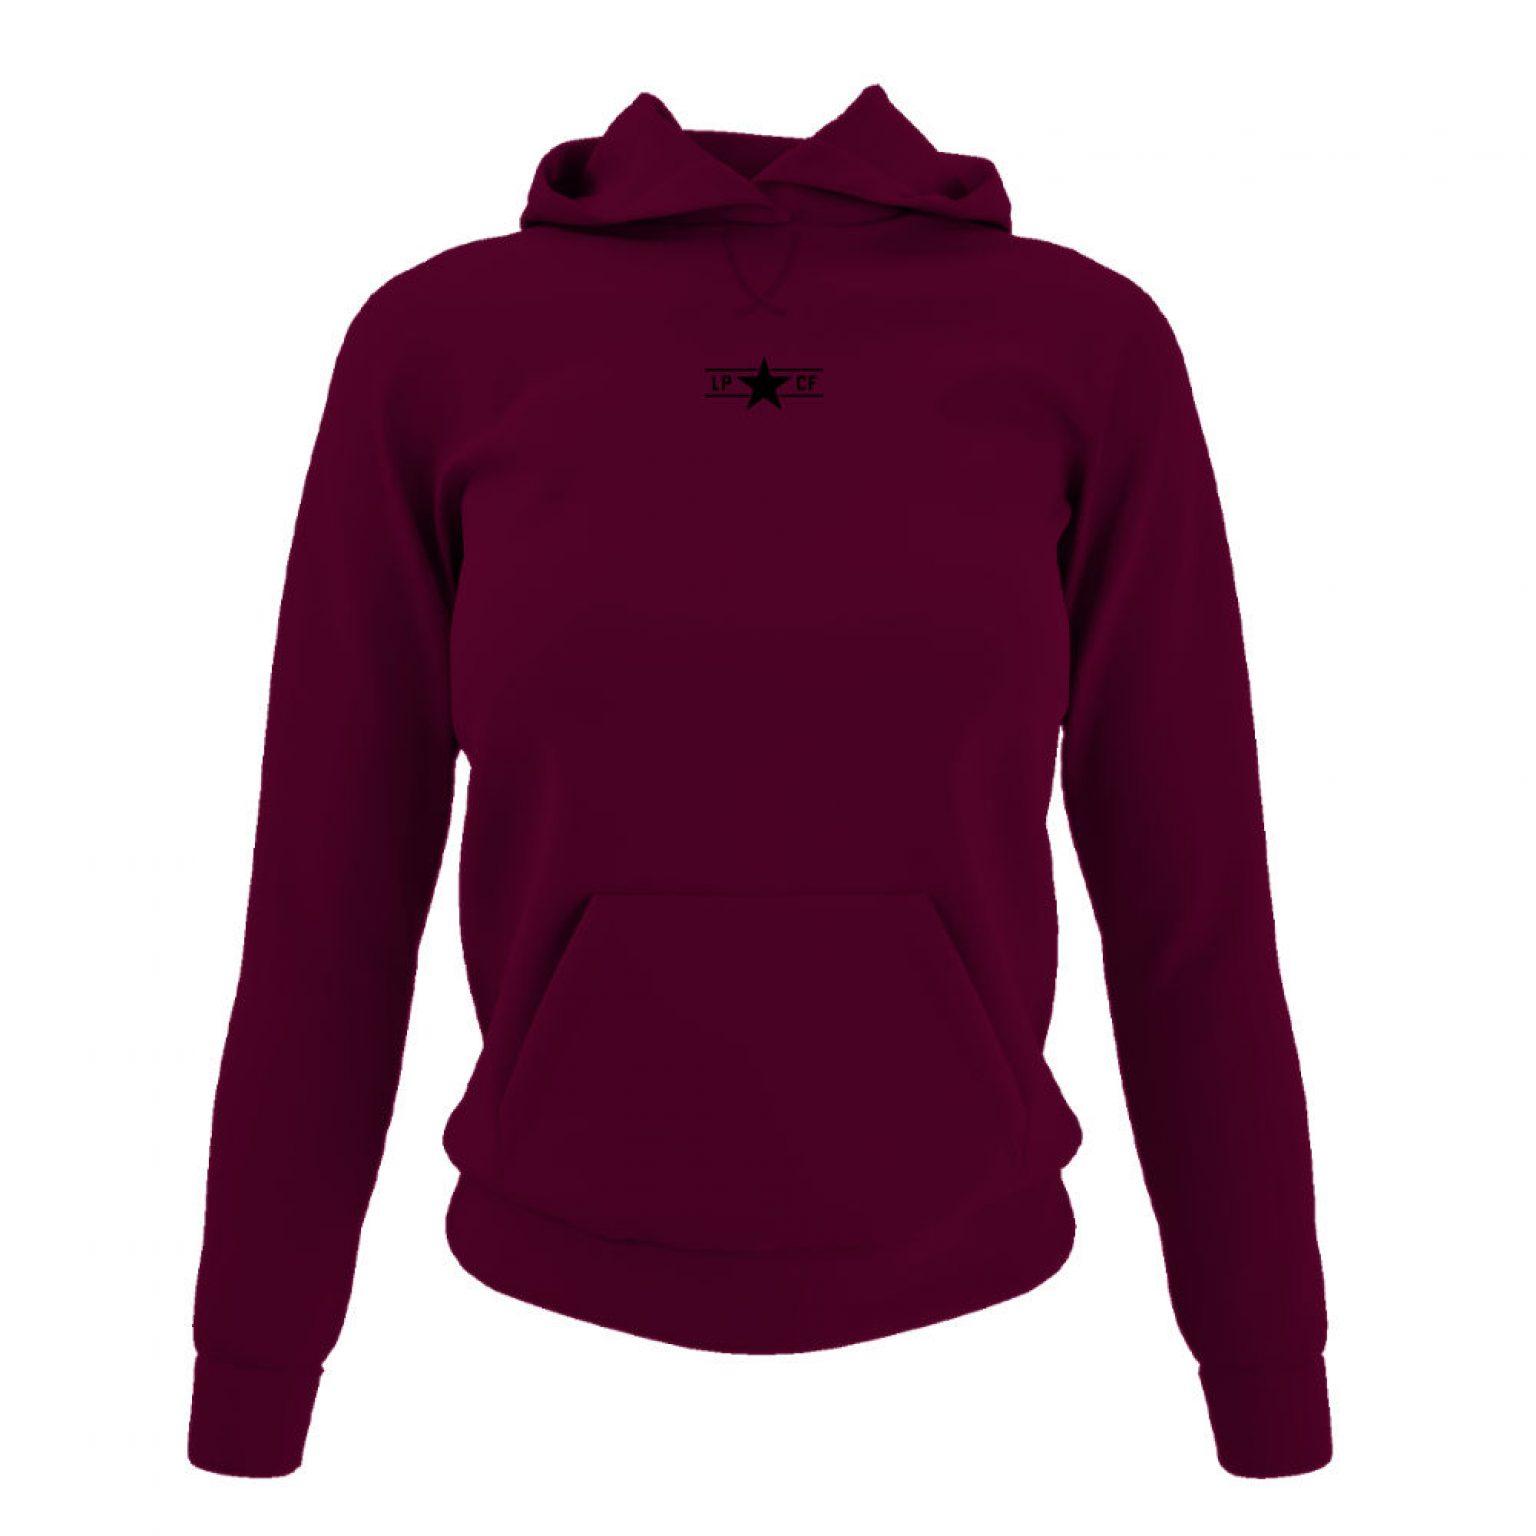 LPcircle hoodie damen burgundy front